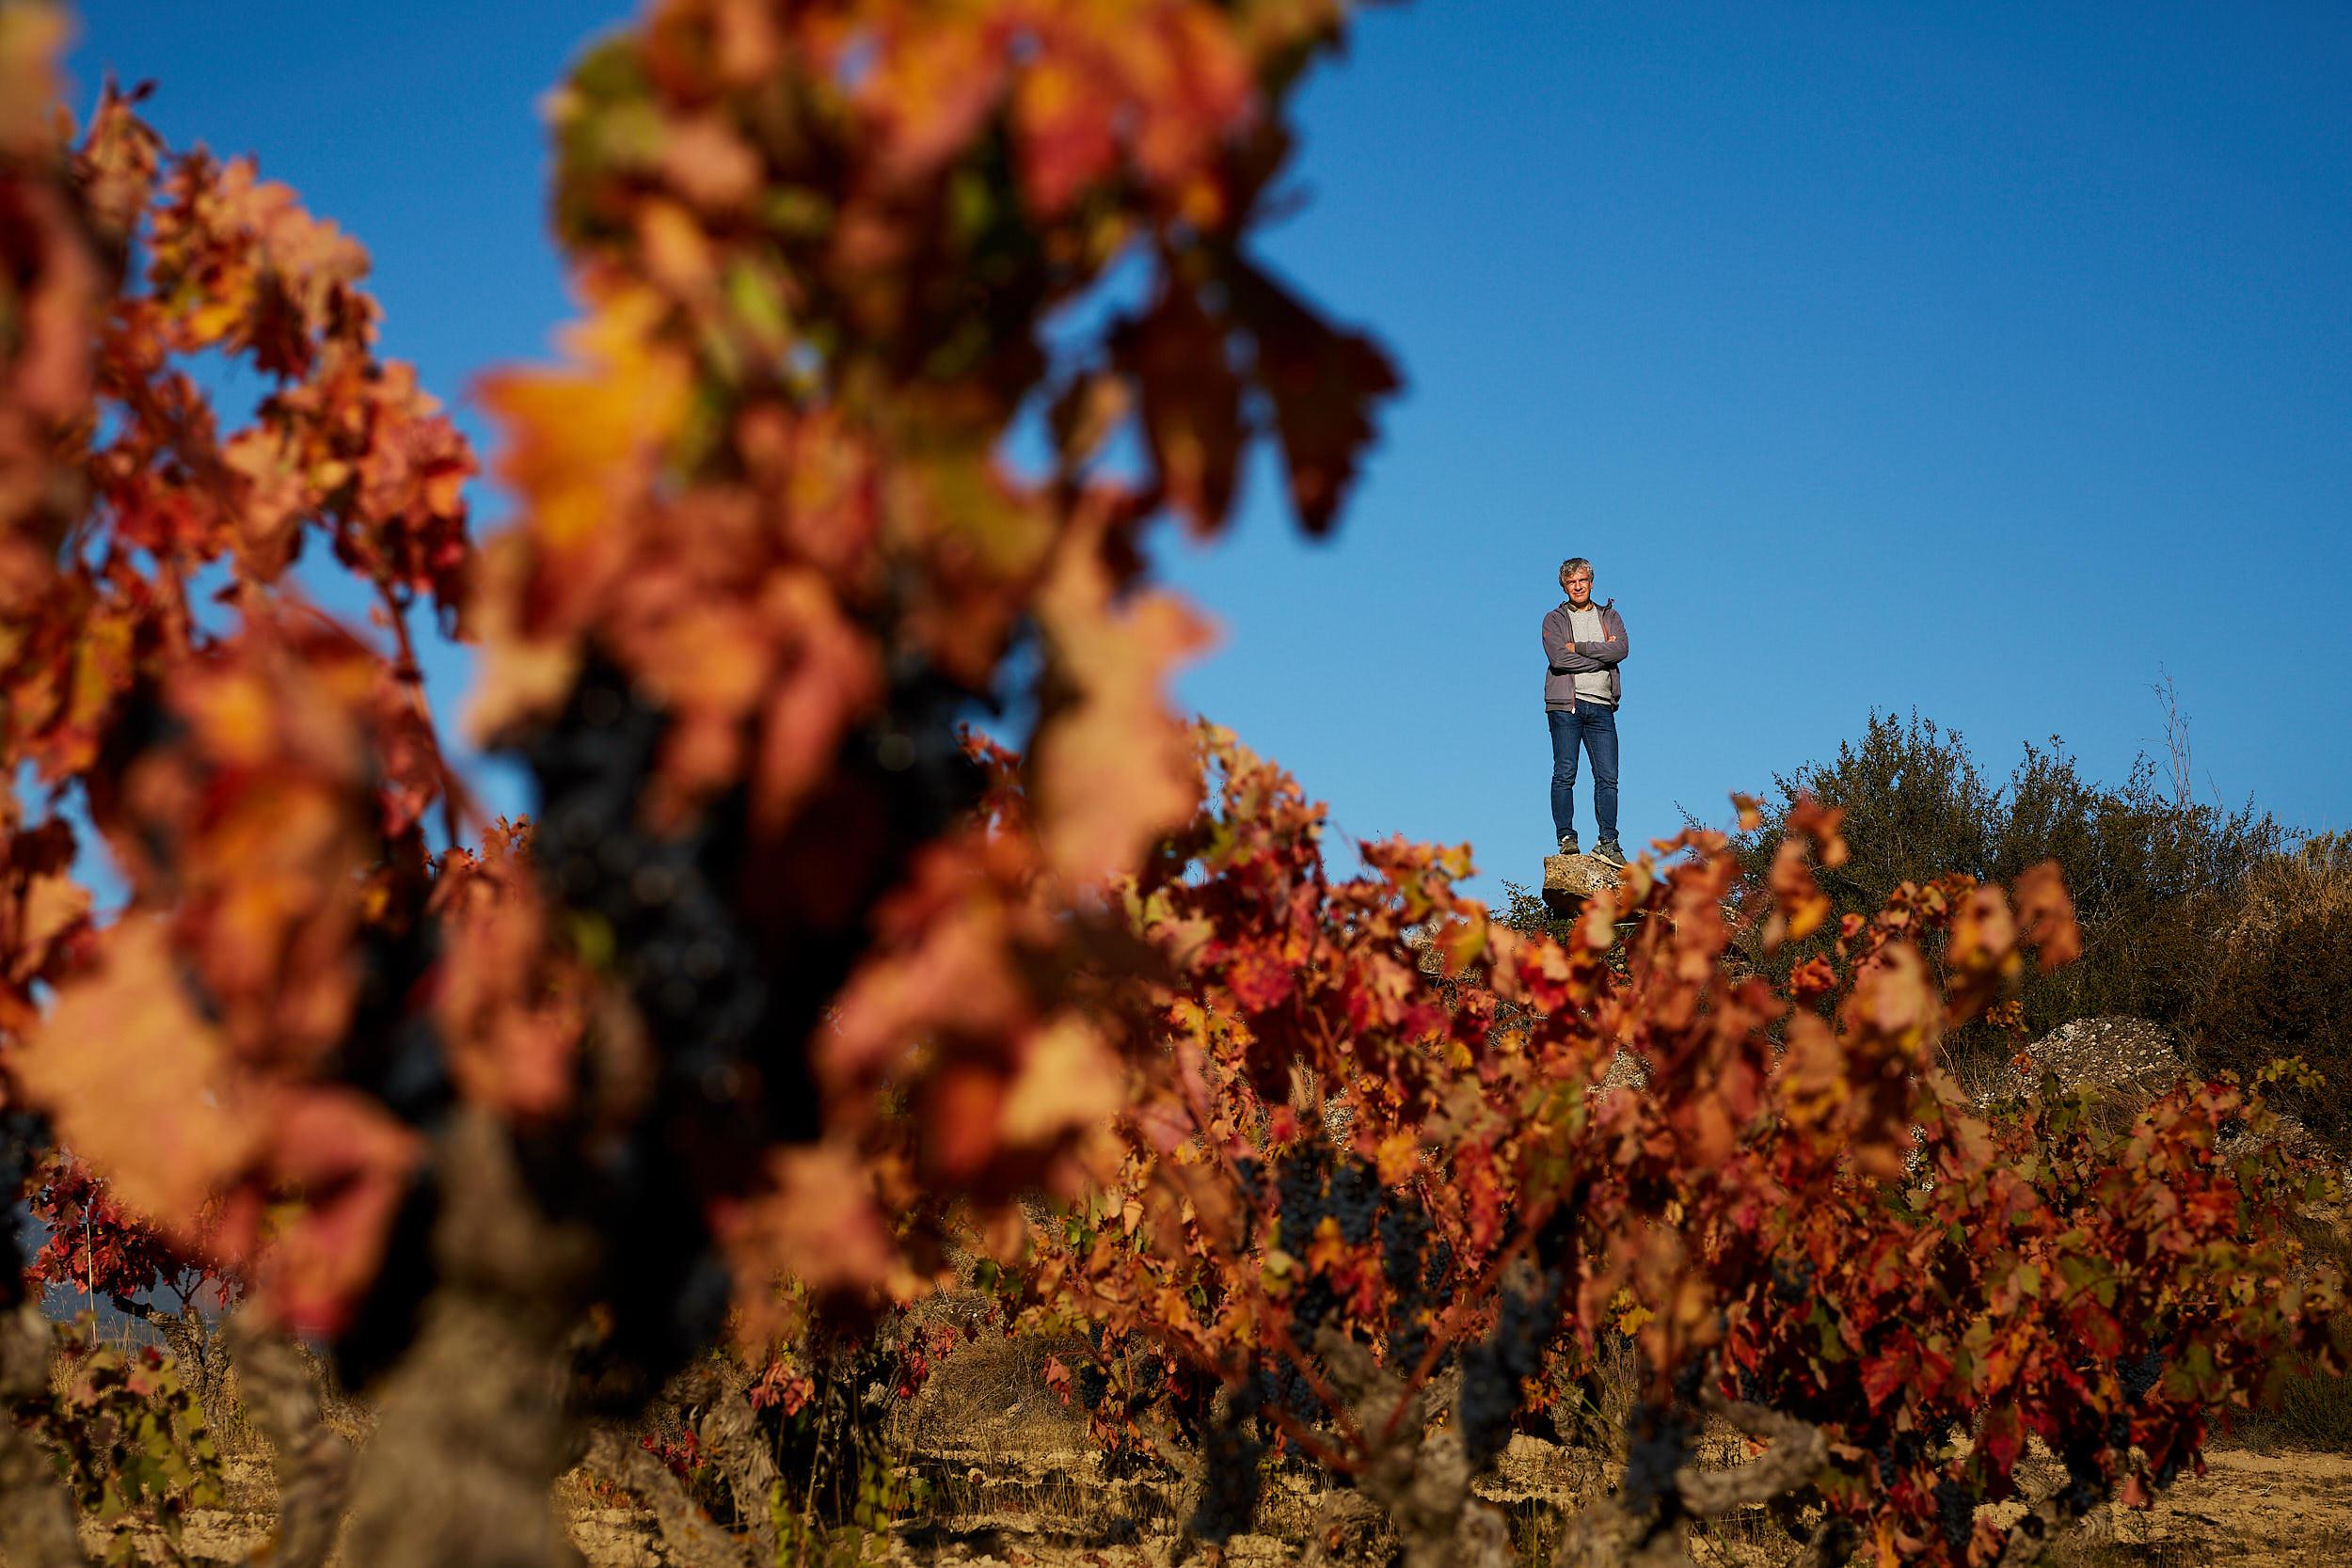 1810Commercial-professional-wine-photography-la-rioja-spain-James-Sturcke_0044.jpg